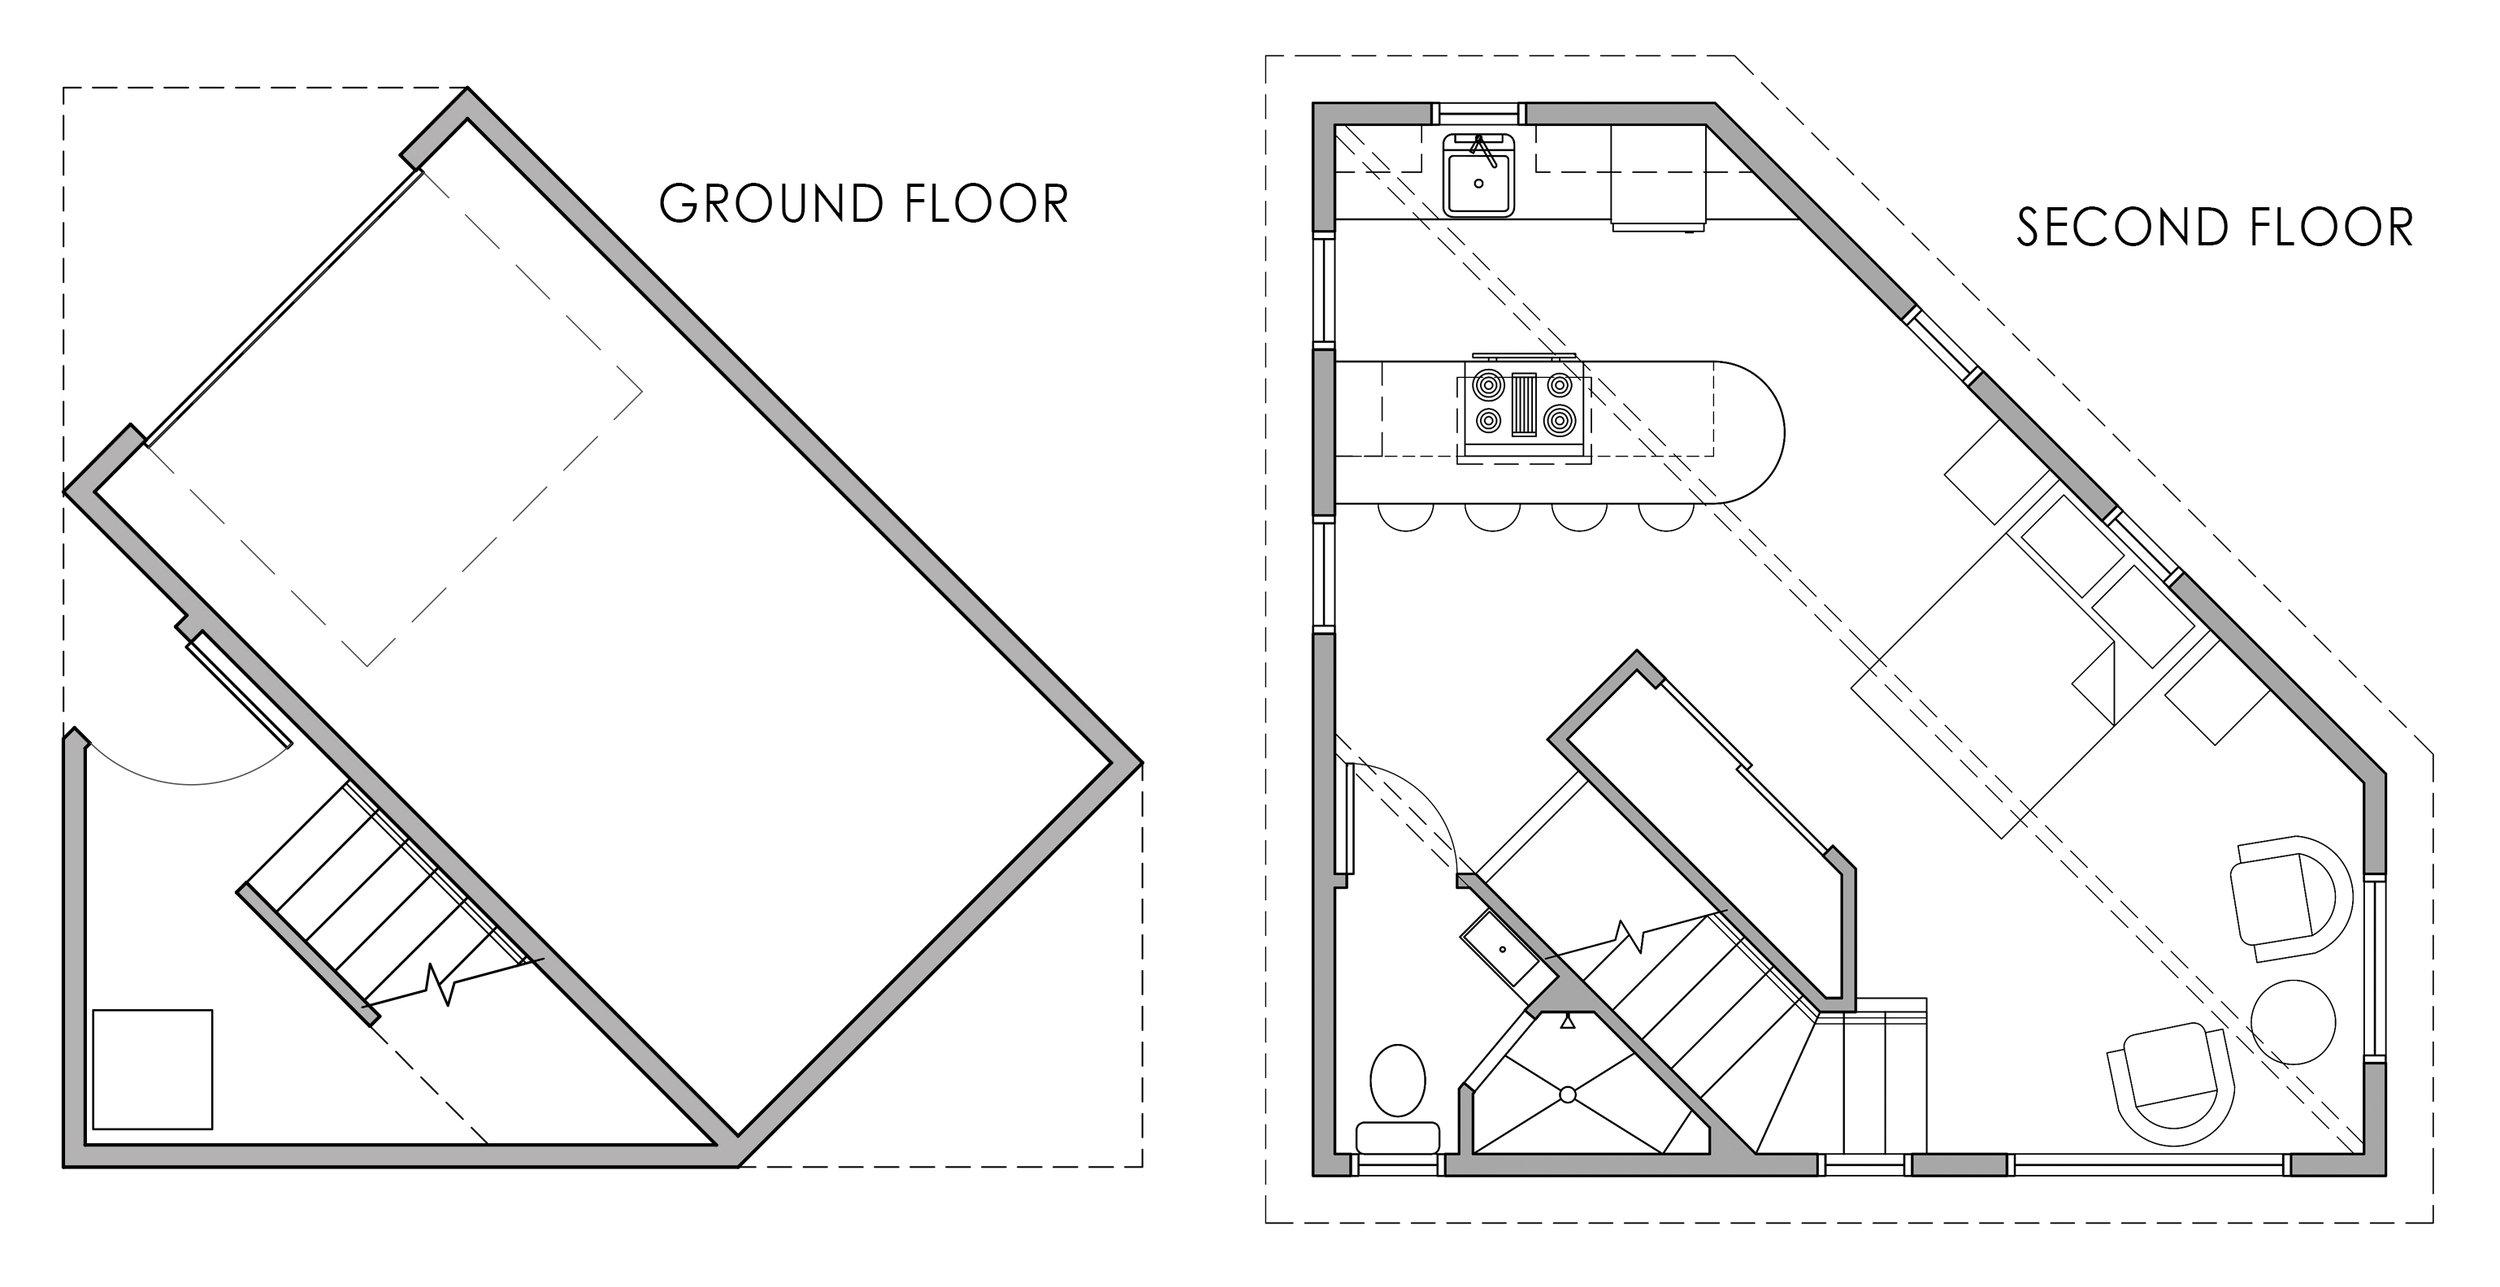 Harka Architecture_Hosford Abernathy ADU (41).jpg